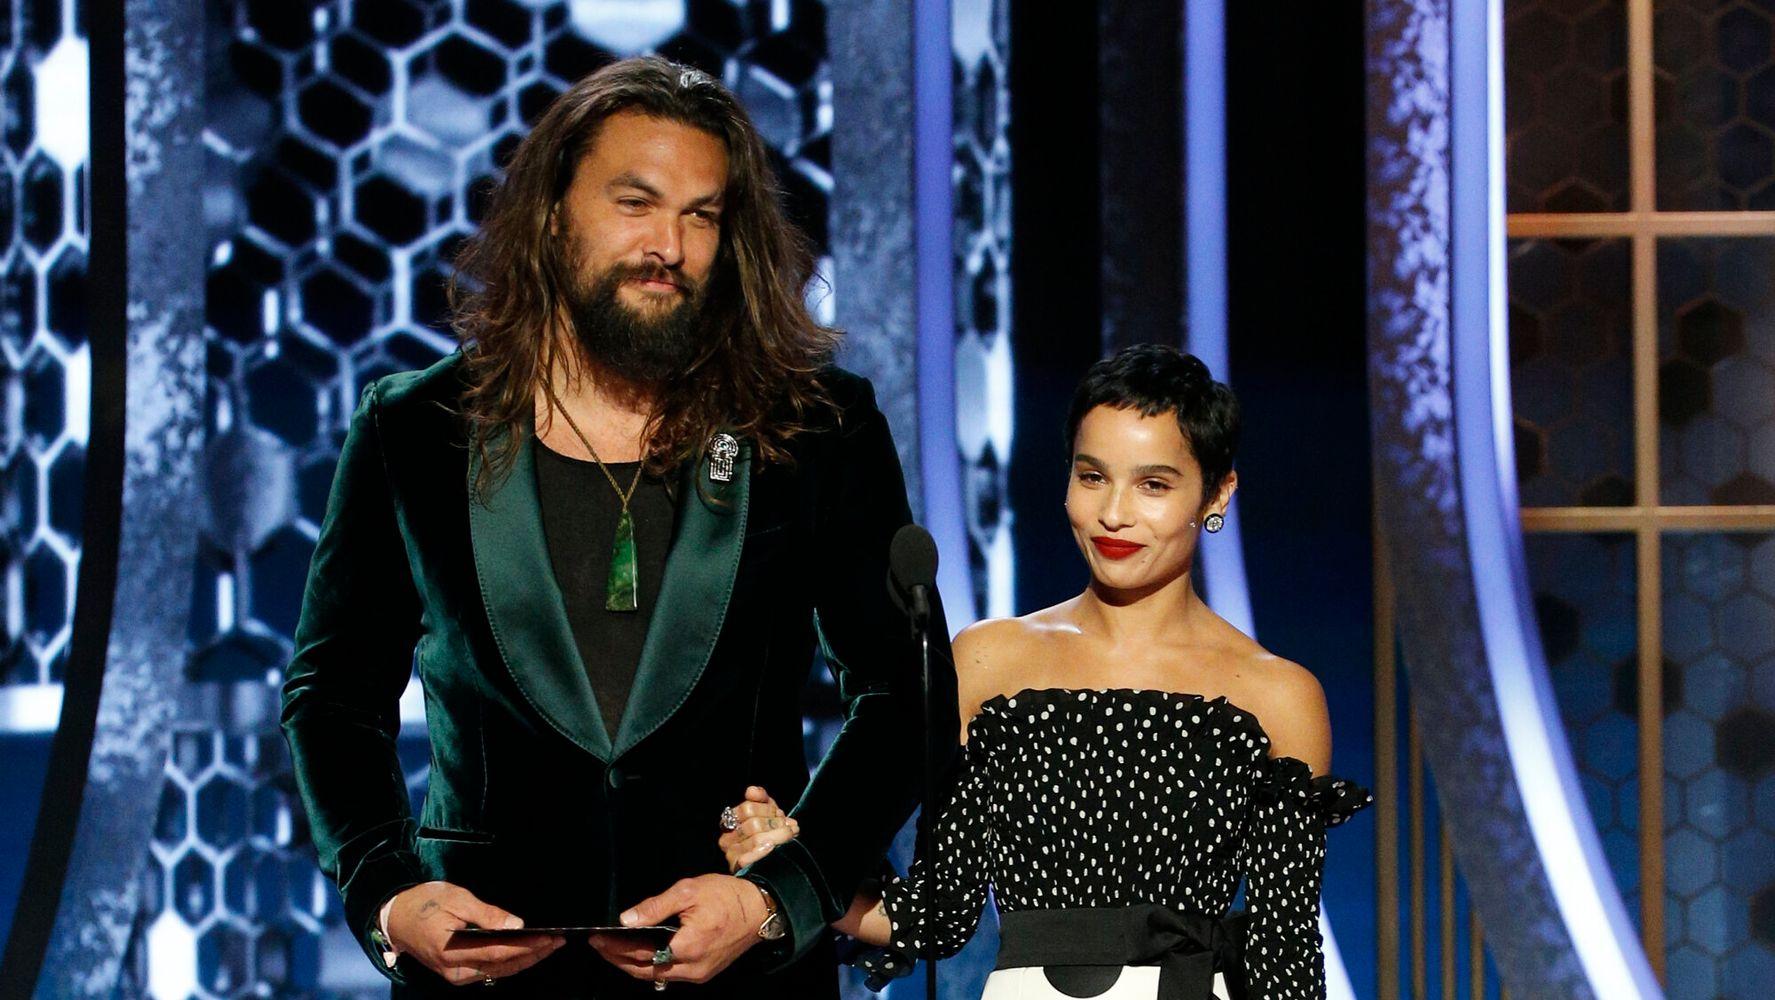 Jason Momoa Zoe Kravitz Have A Golden Globe Family Reunion